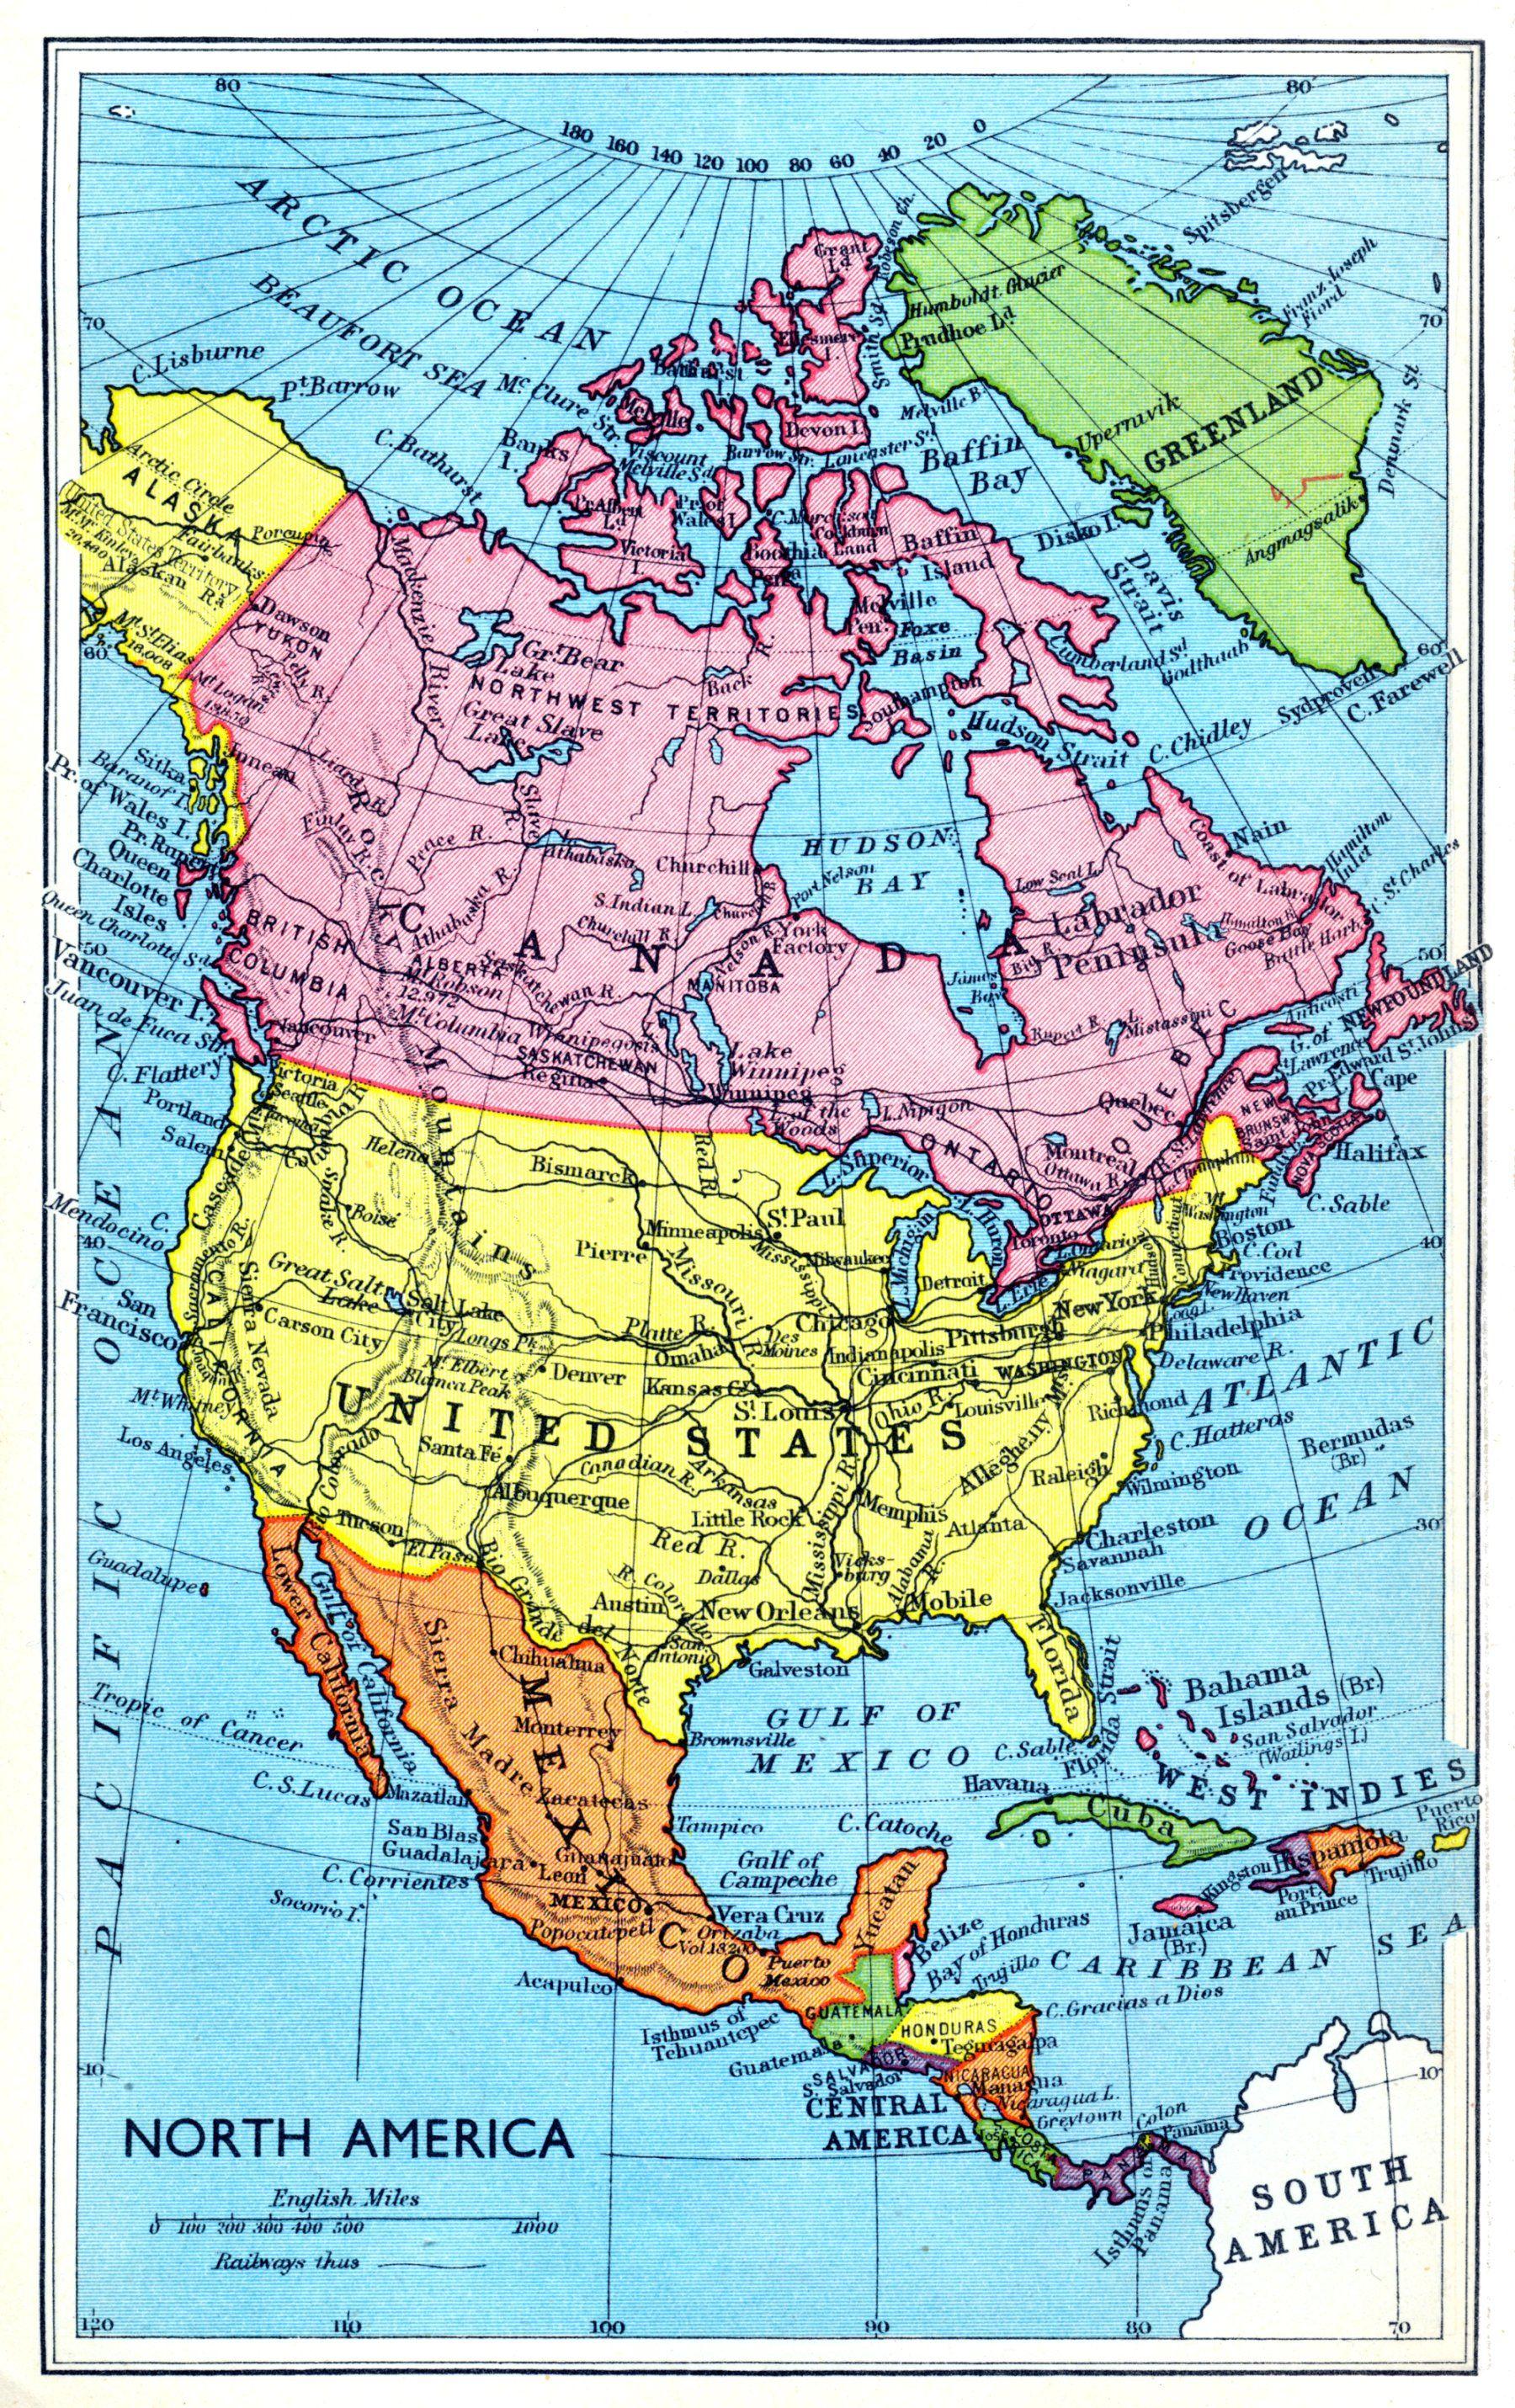 map of north america 1949